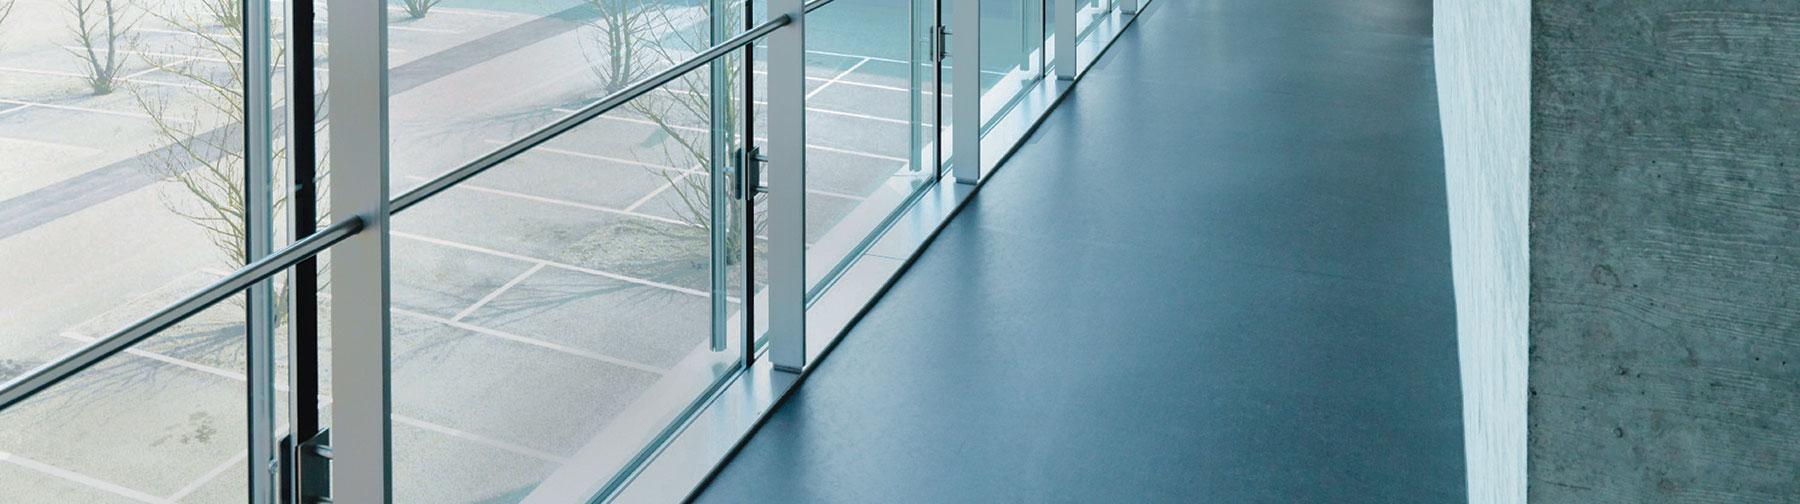 convergent group - LG - pentra - concrete - floor